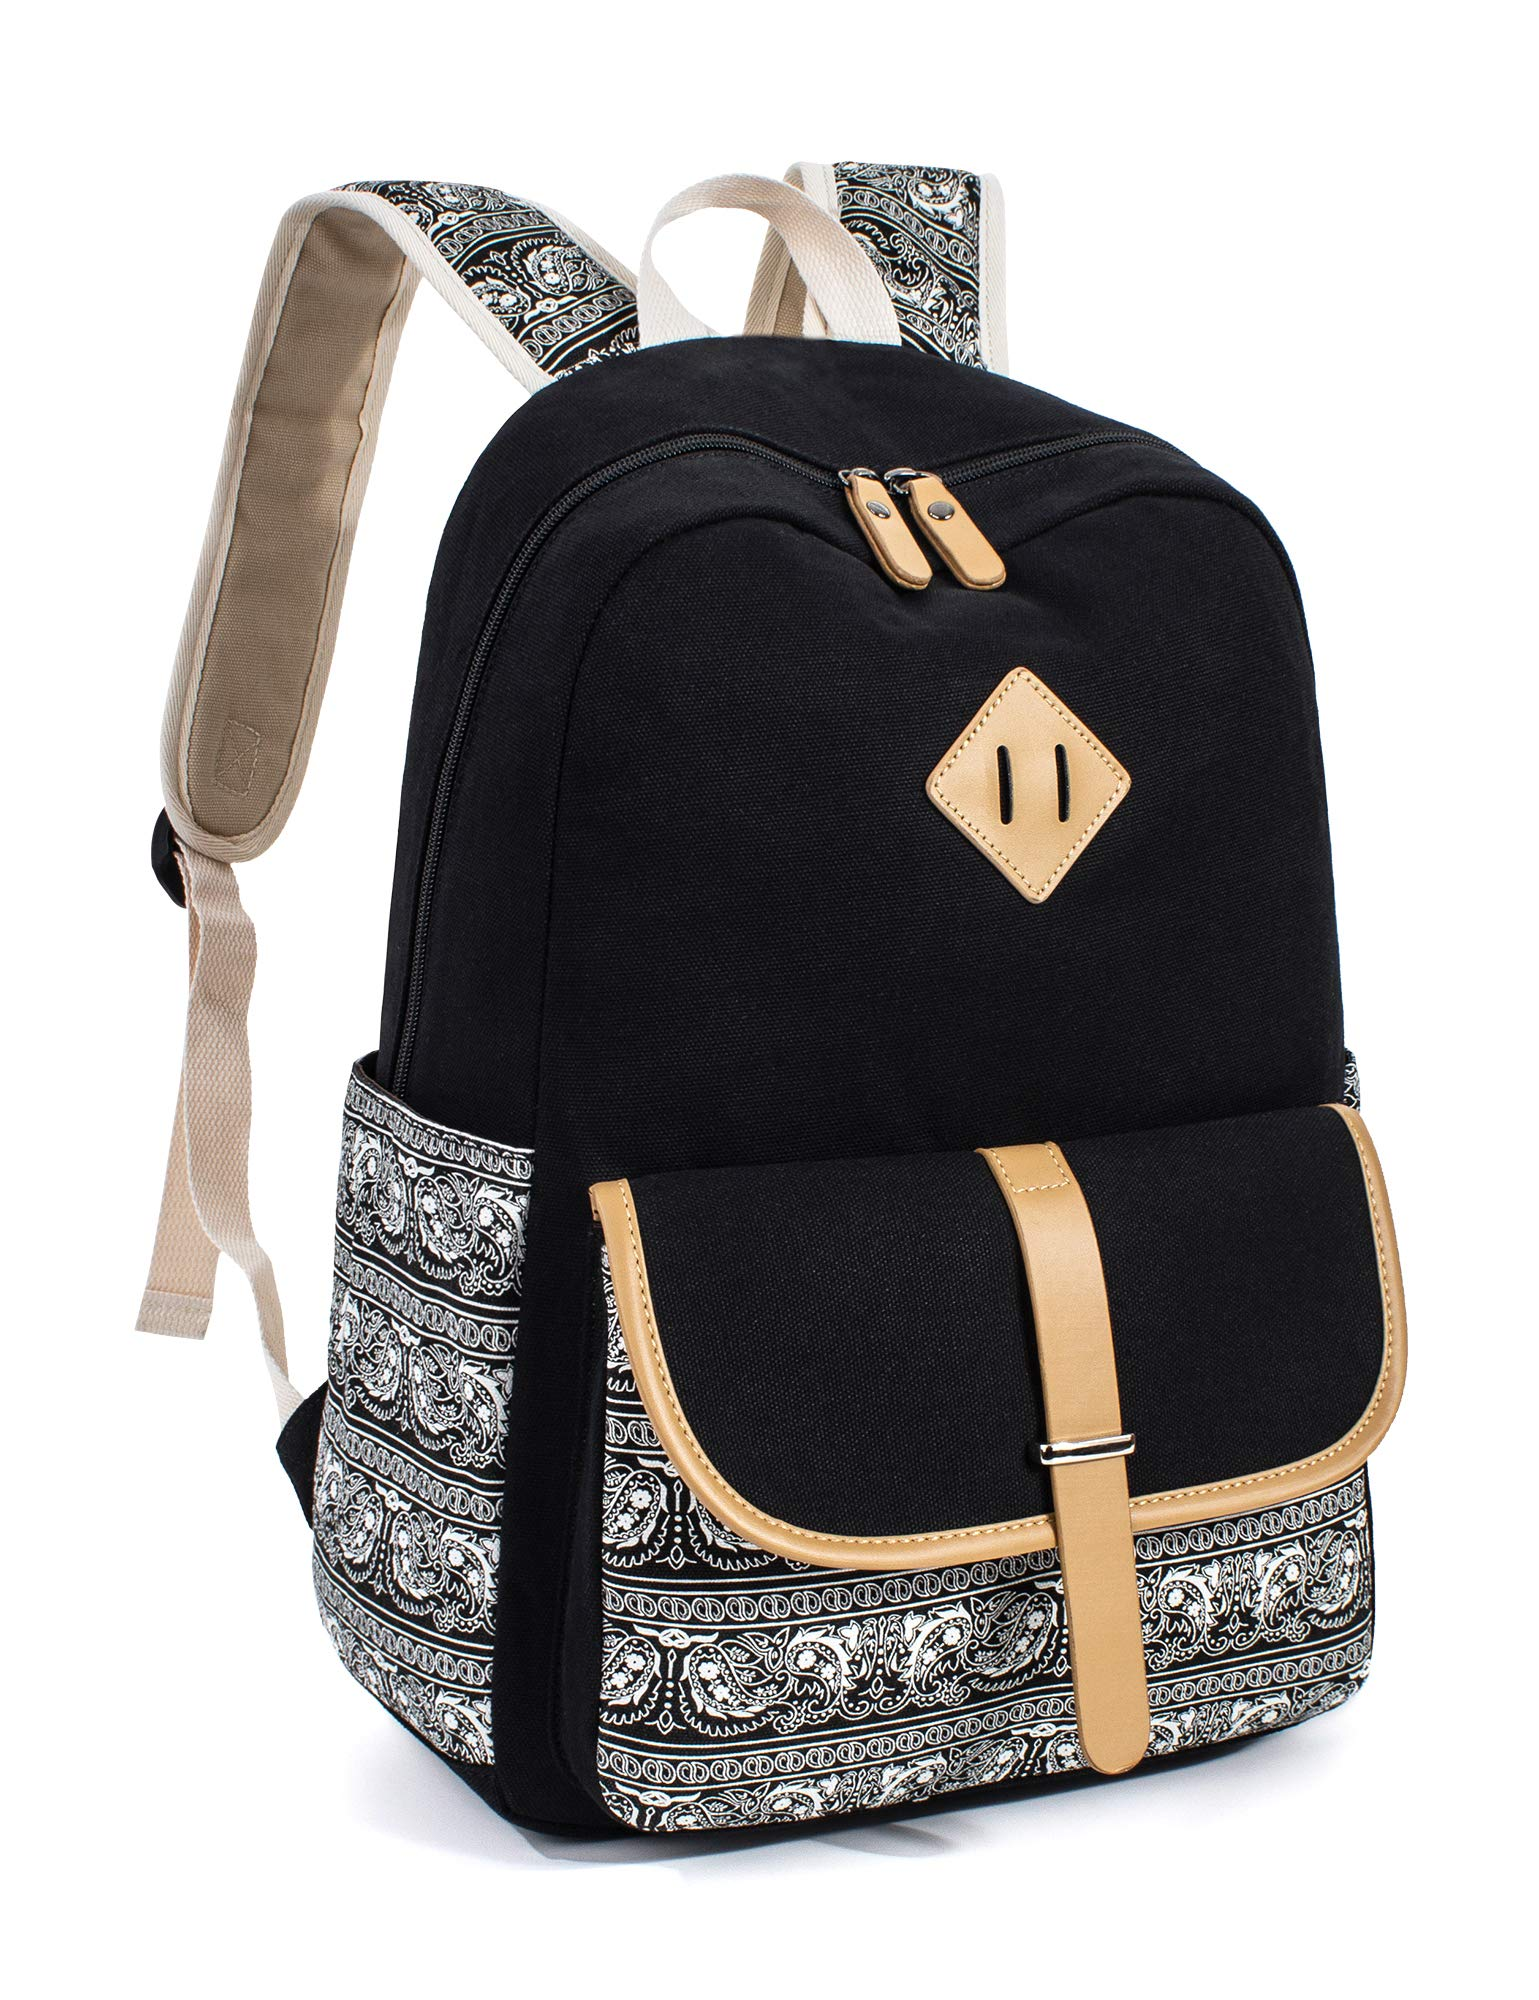 Leaper Cute Backpack Laptop Backpack School Bag Travel Daypack Black [8812]